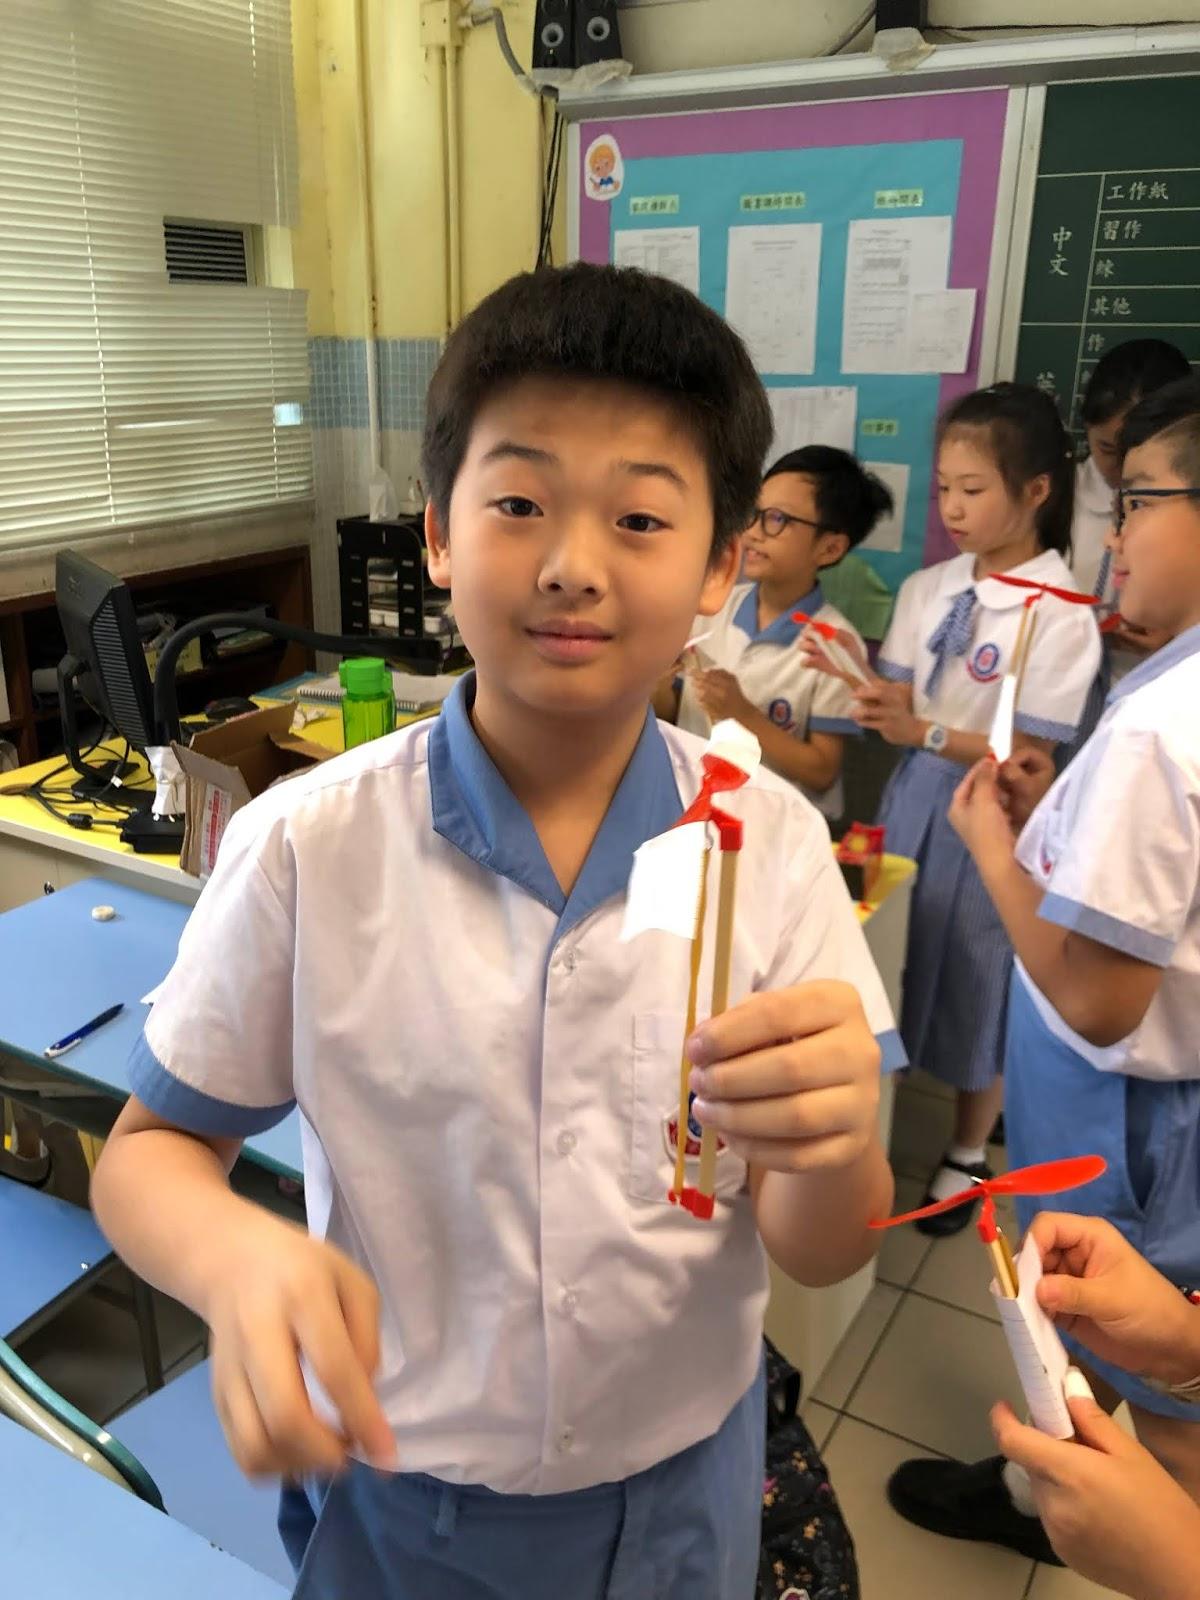 Welcome to 5C Family: 常識體驗課。用竹蜻蜓學習能量轉換。同學仔表示好好玩呀!!